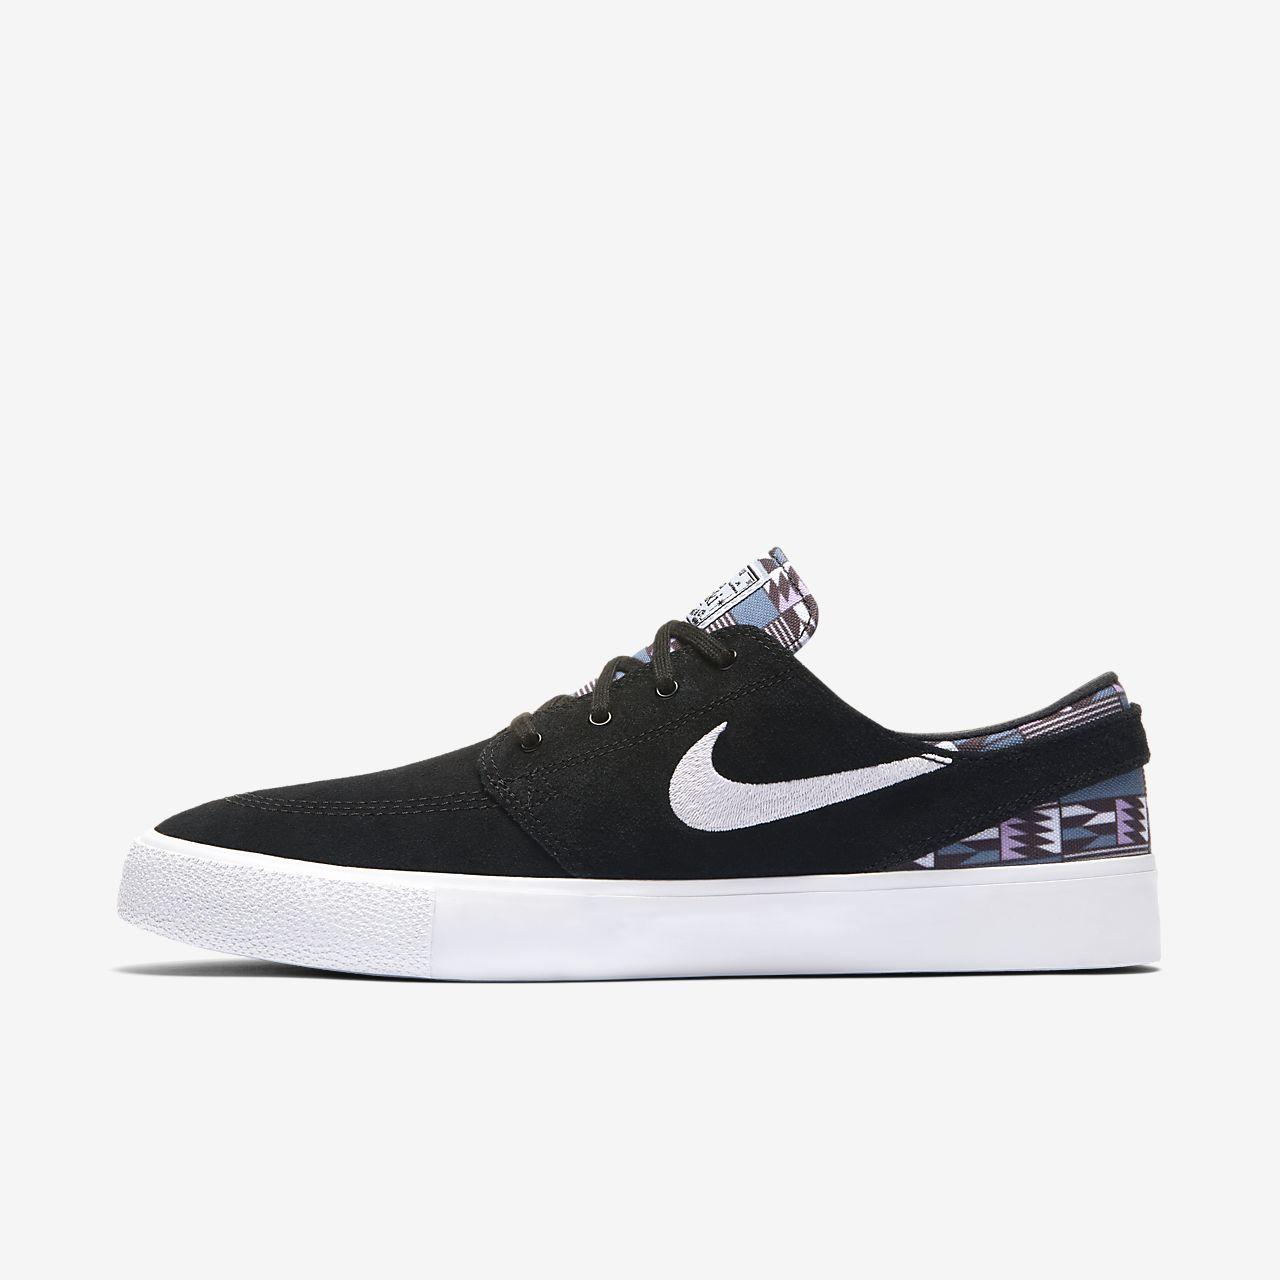 Nike SB Zoom Stefan Janoski RM Premium Zapatillas de skateboard